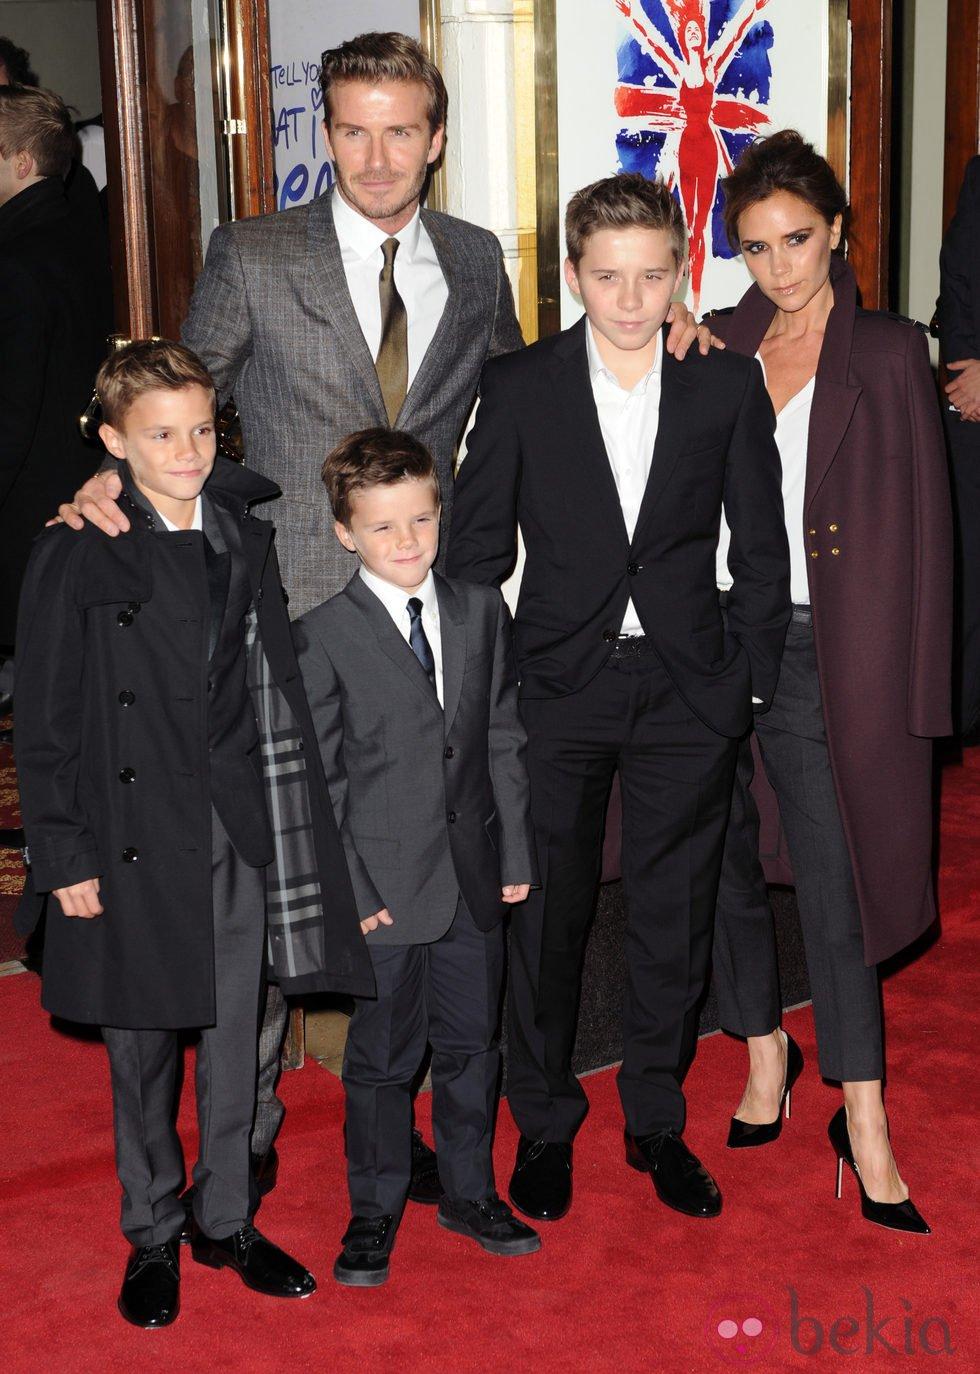 La familia Beckham en el estreno del musical 'Viva Forever!'